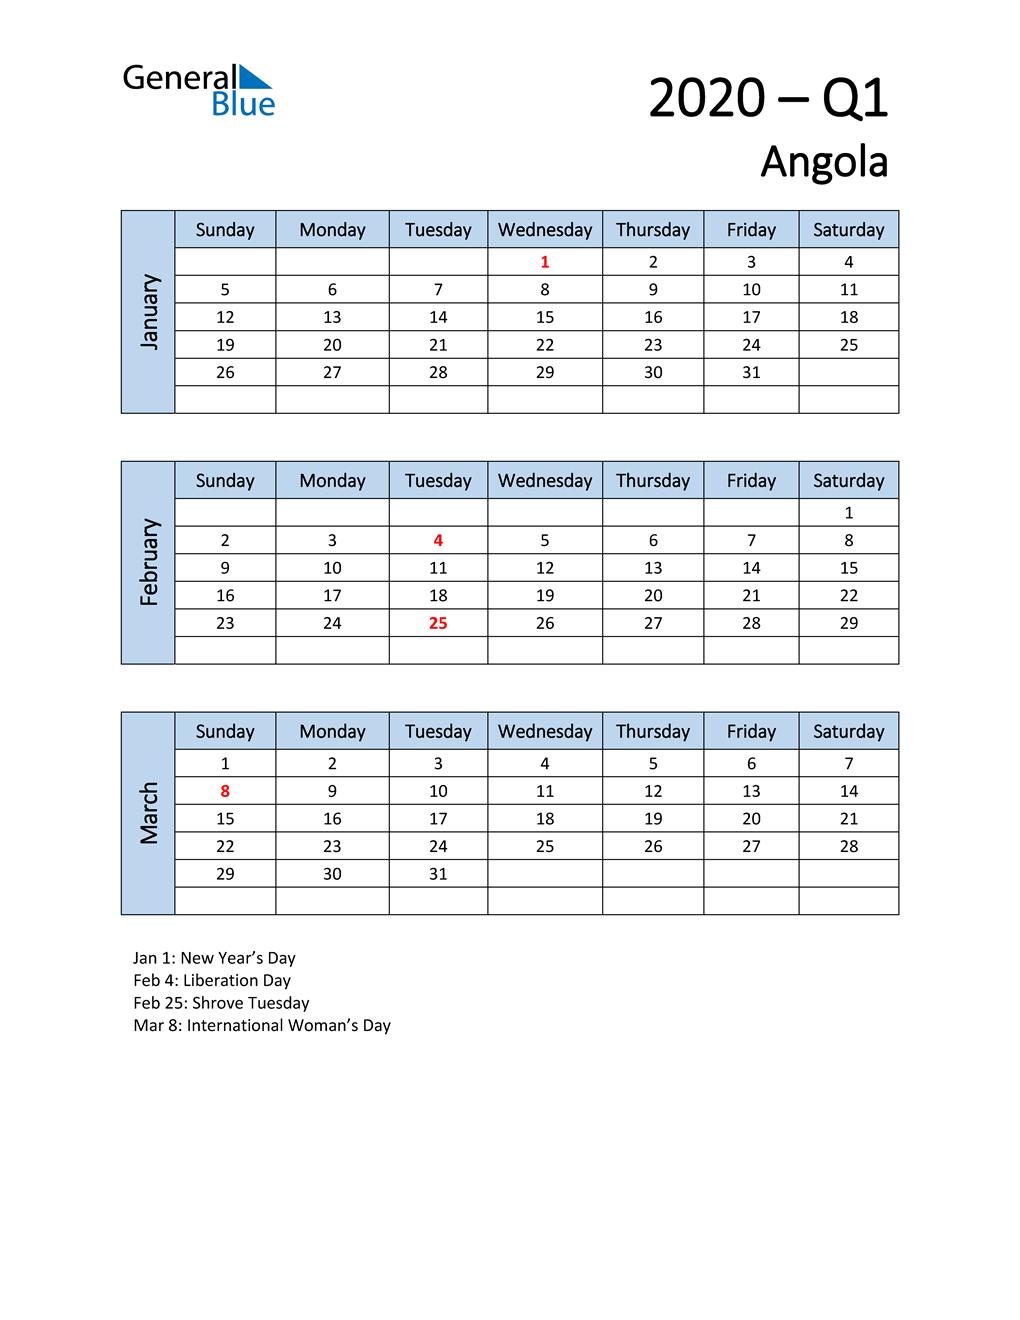 Free Q1 2020 Calendar for Angola